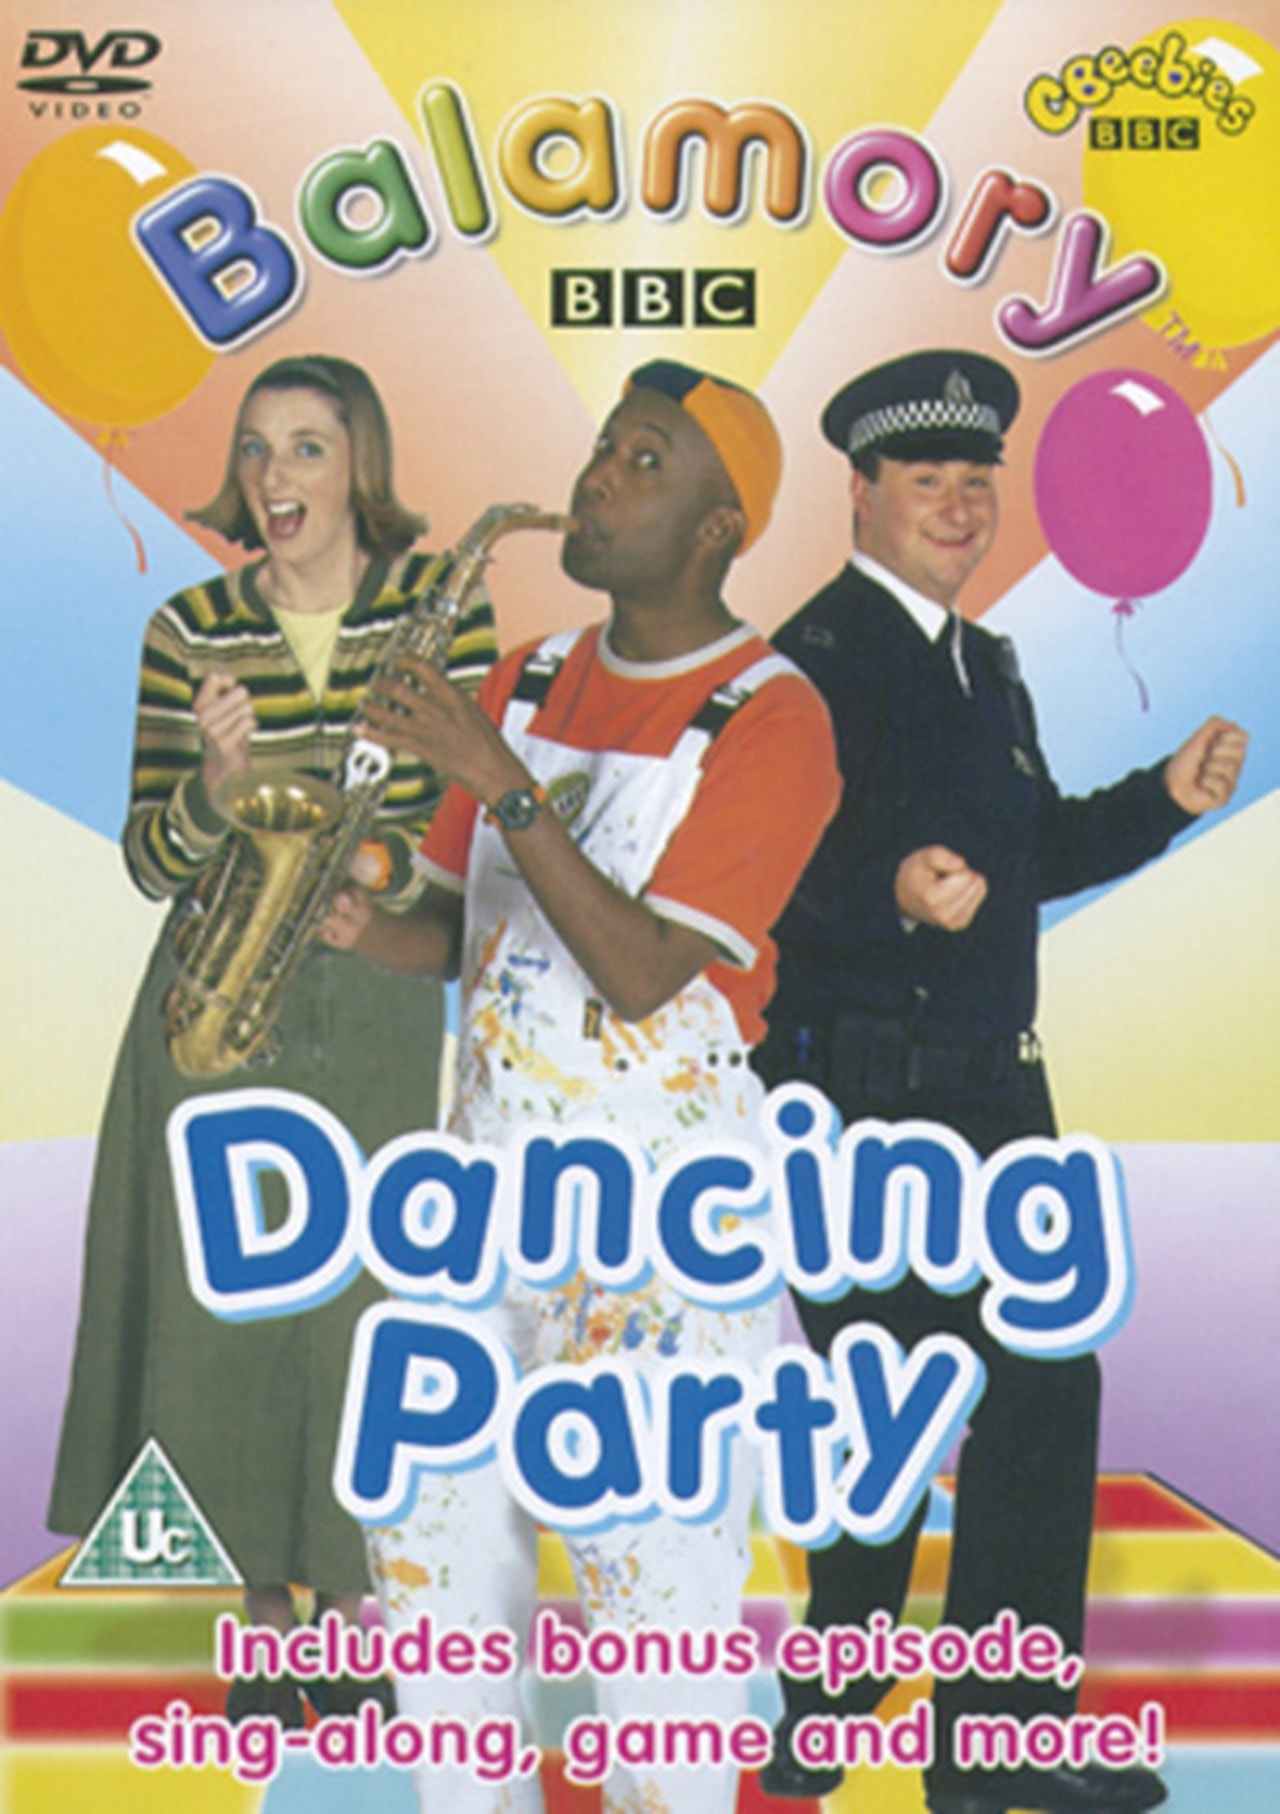 Balamory: Dancing Party - 1